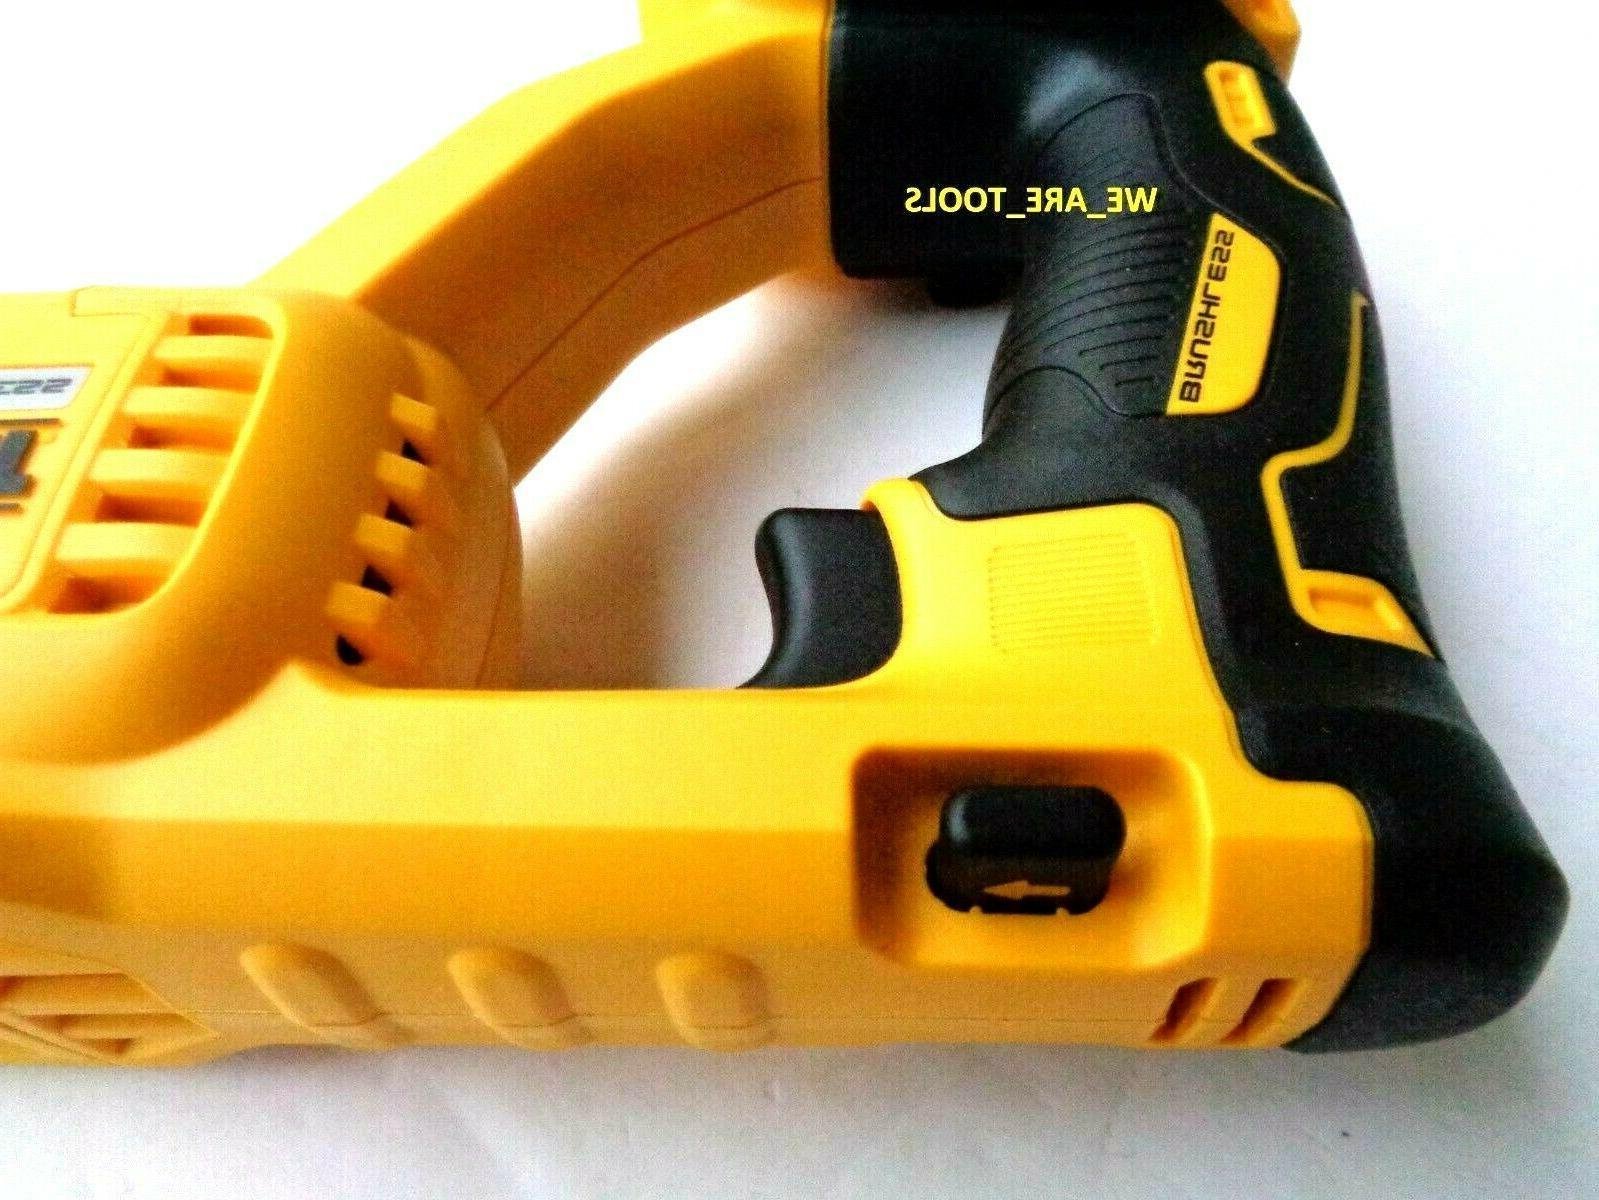 New SDS Drill, 5.0 Battery 20 Volt